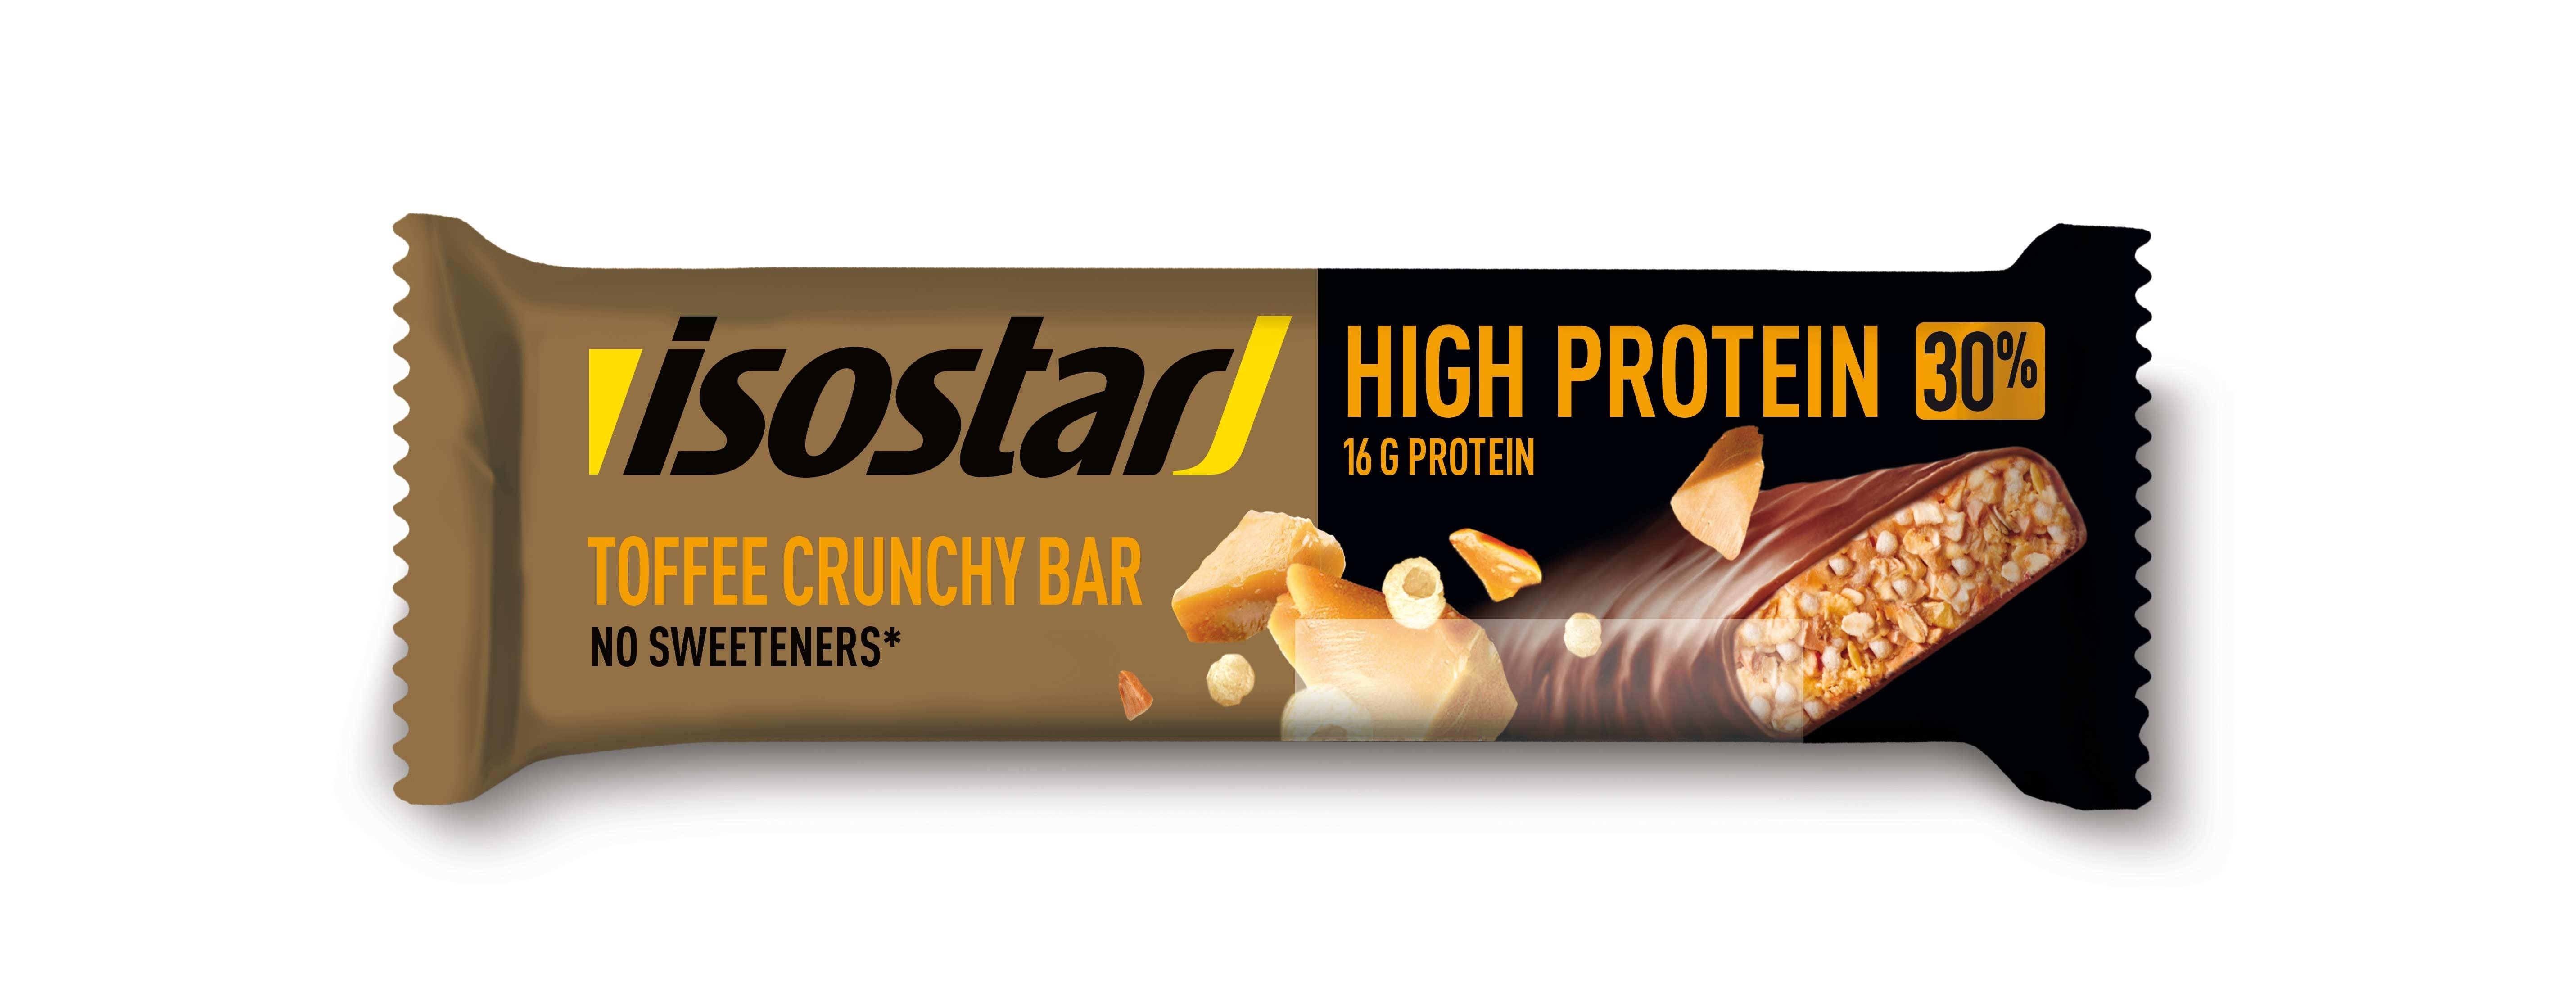 ISOSTAR proteinová tyčinka 30% 55g křupavý karamel